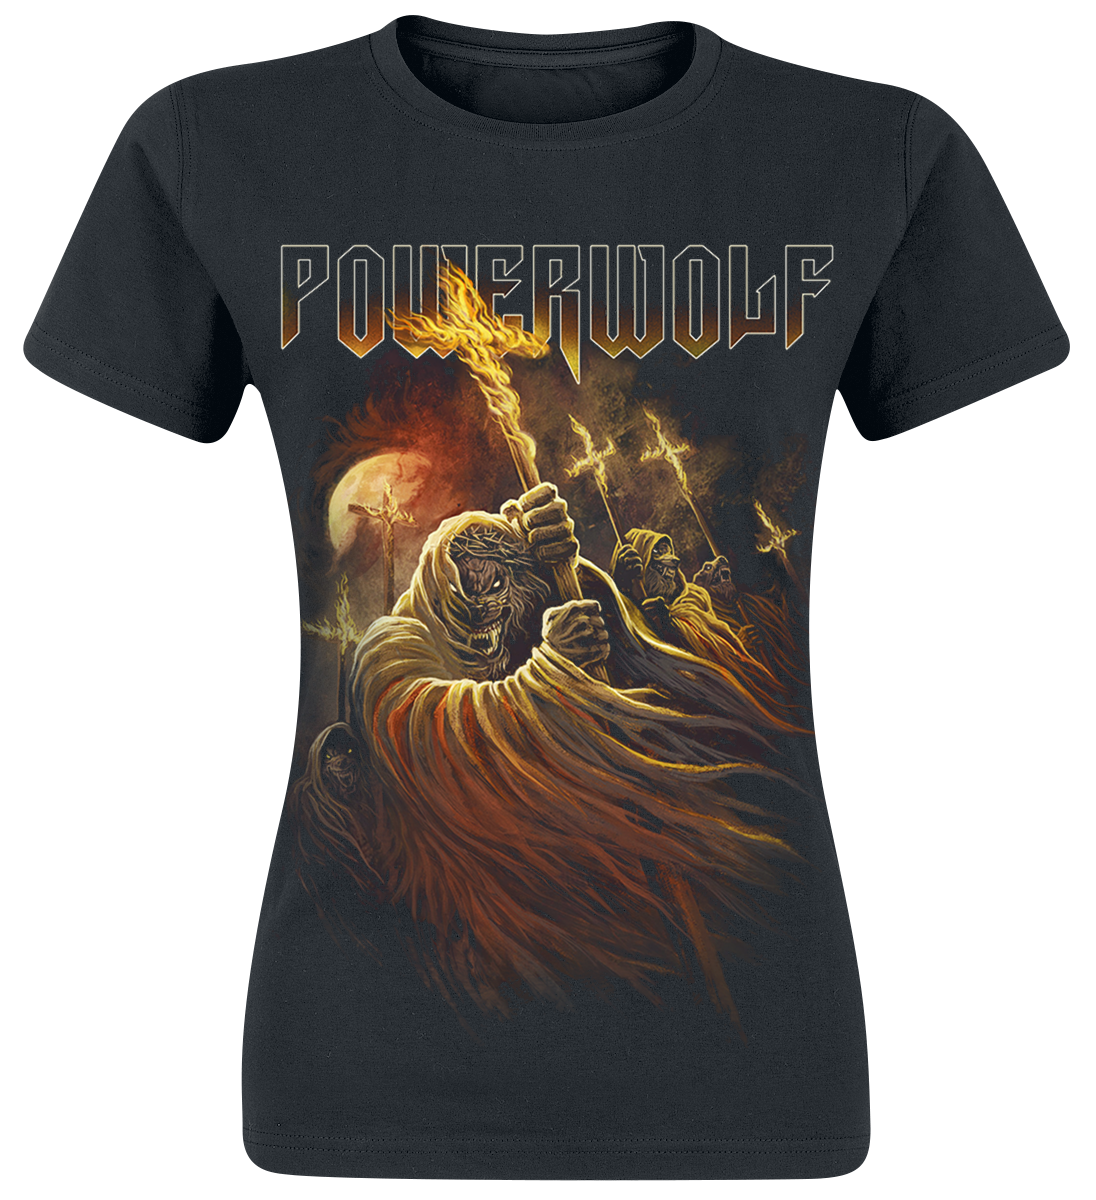 Powerwolf - Kreuzfeuer - Girls shirt - black image